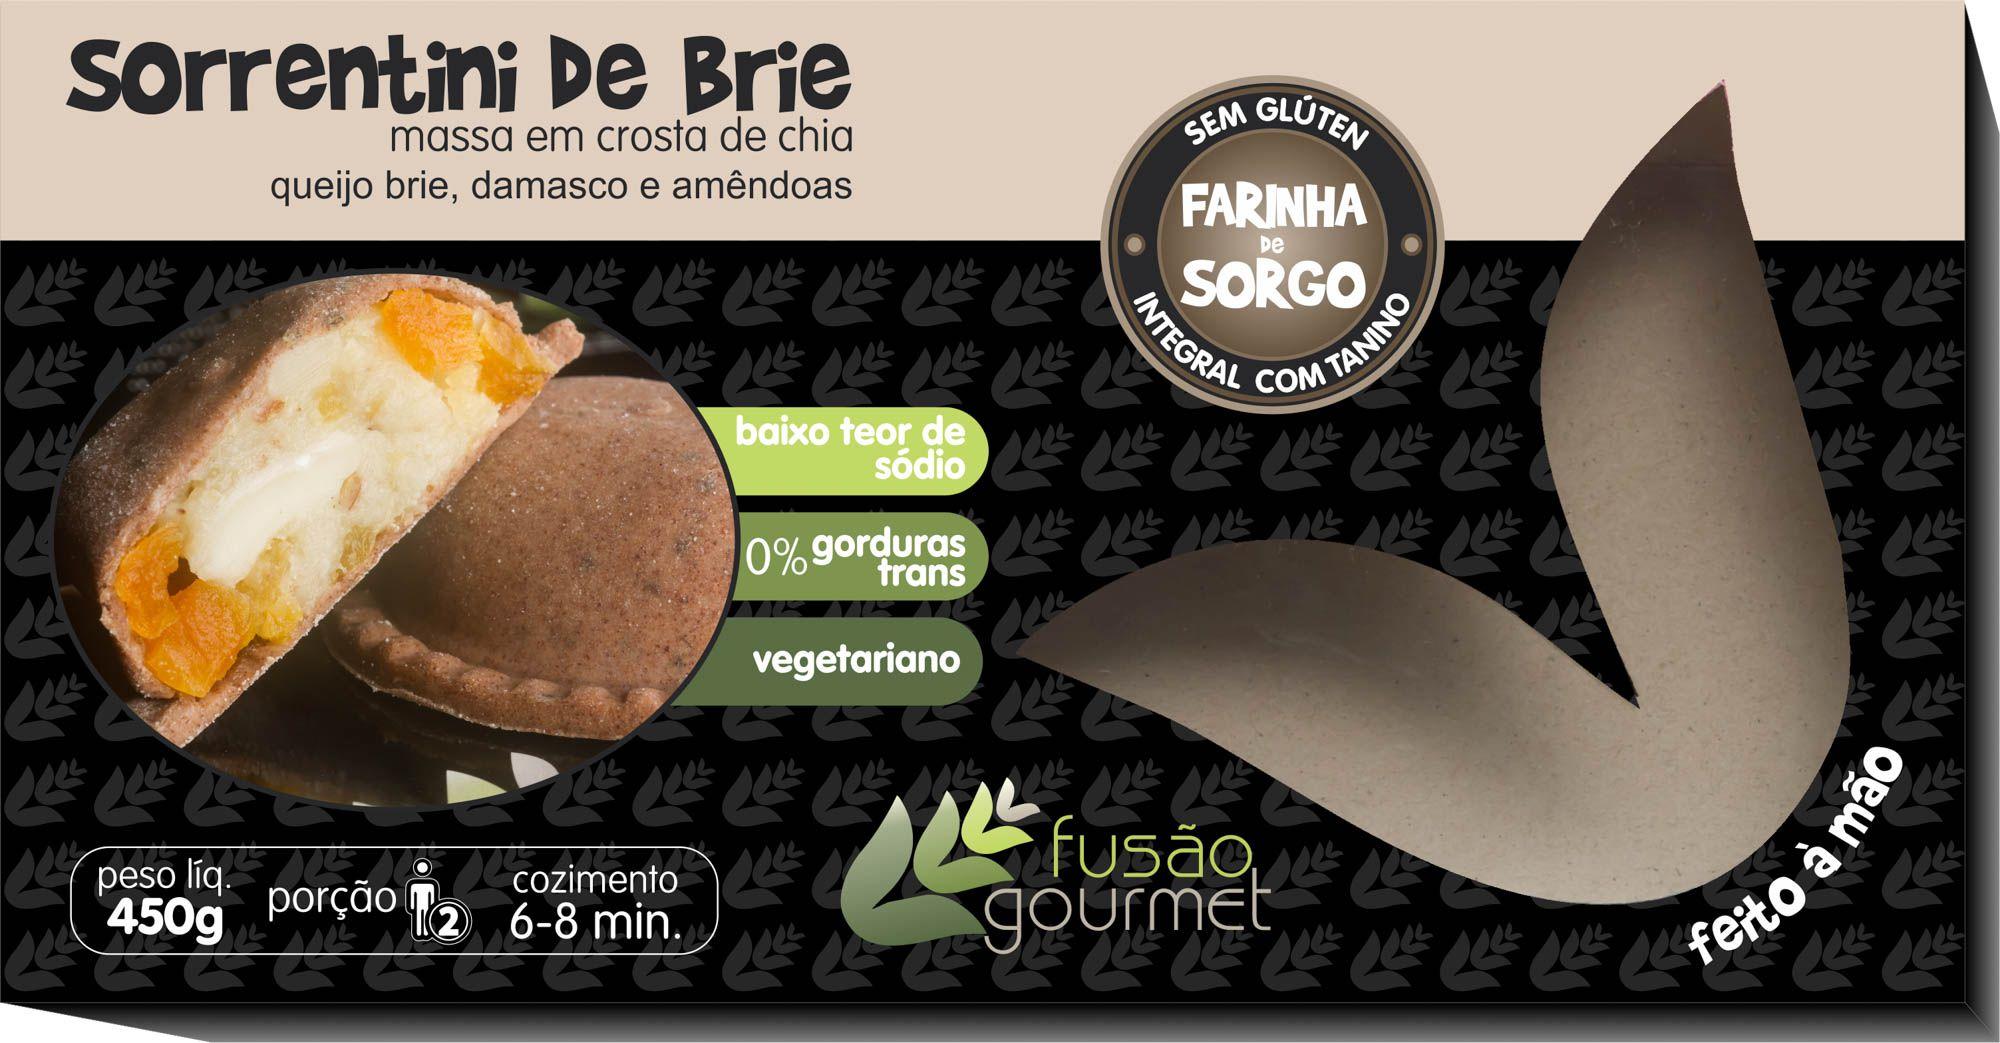 Sorrentini de Brie